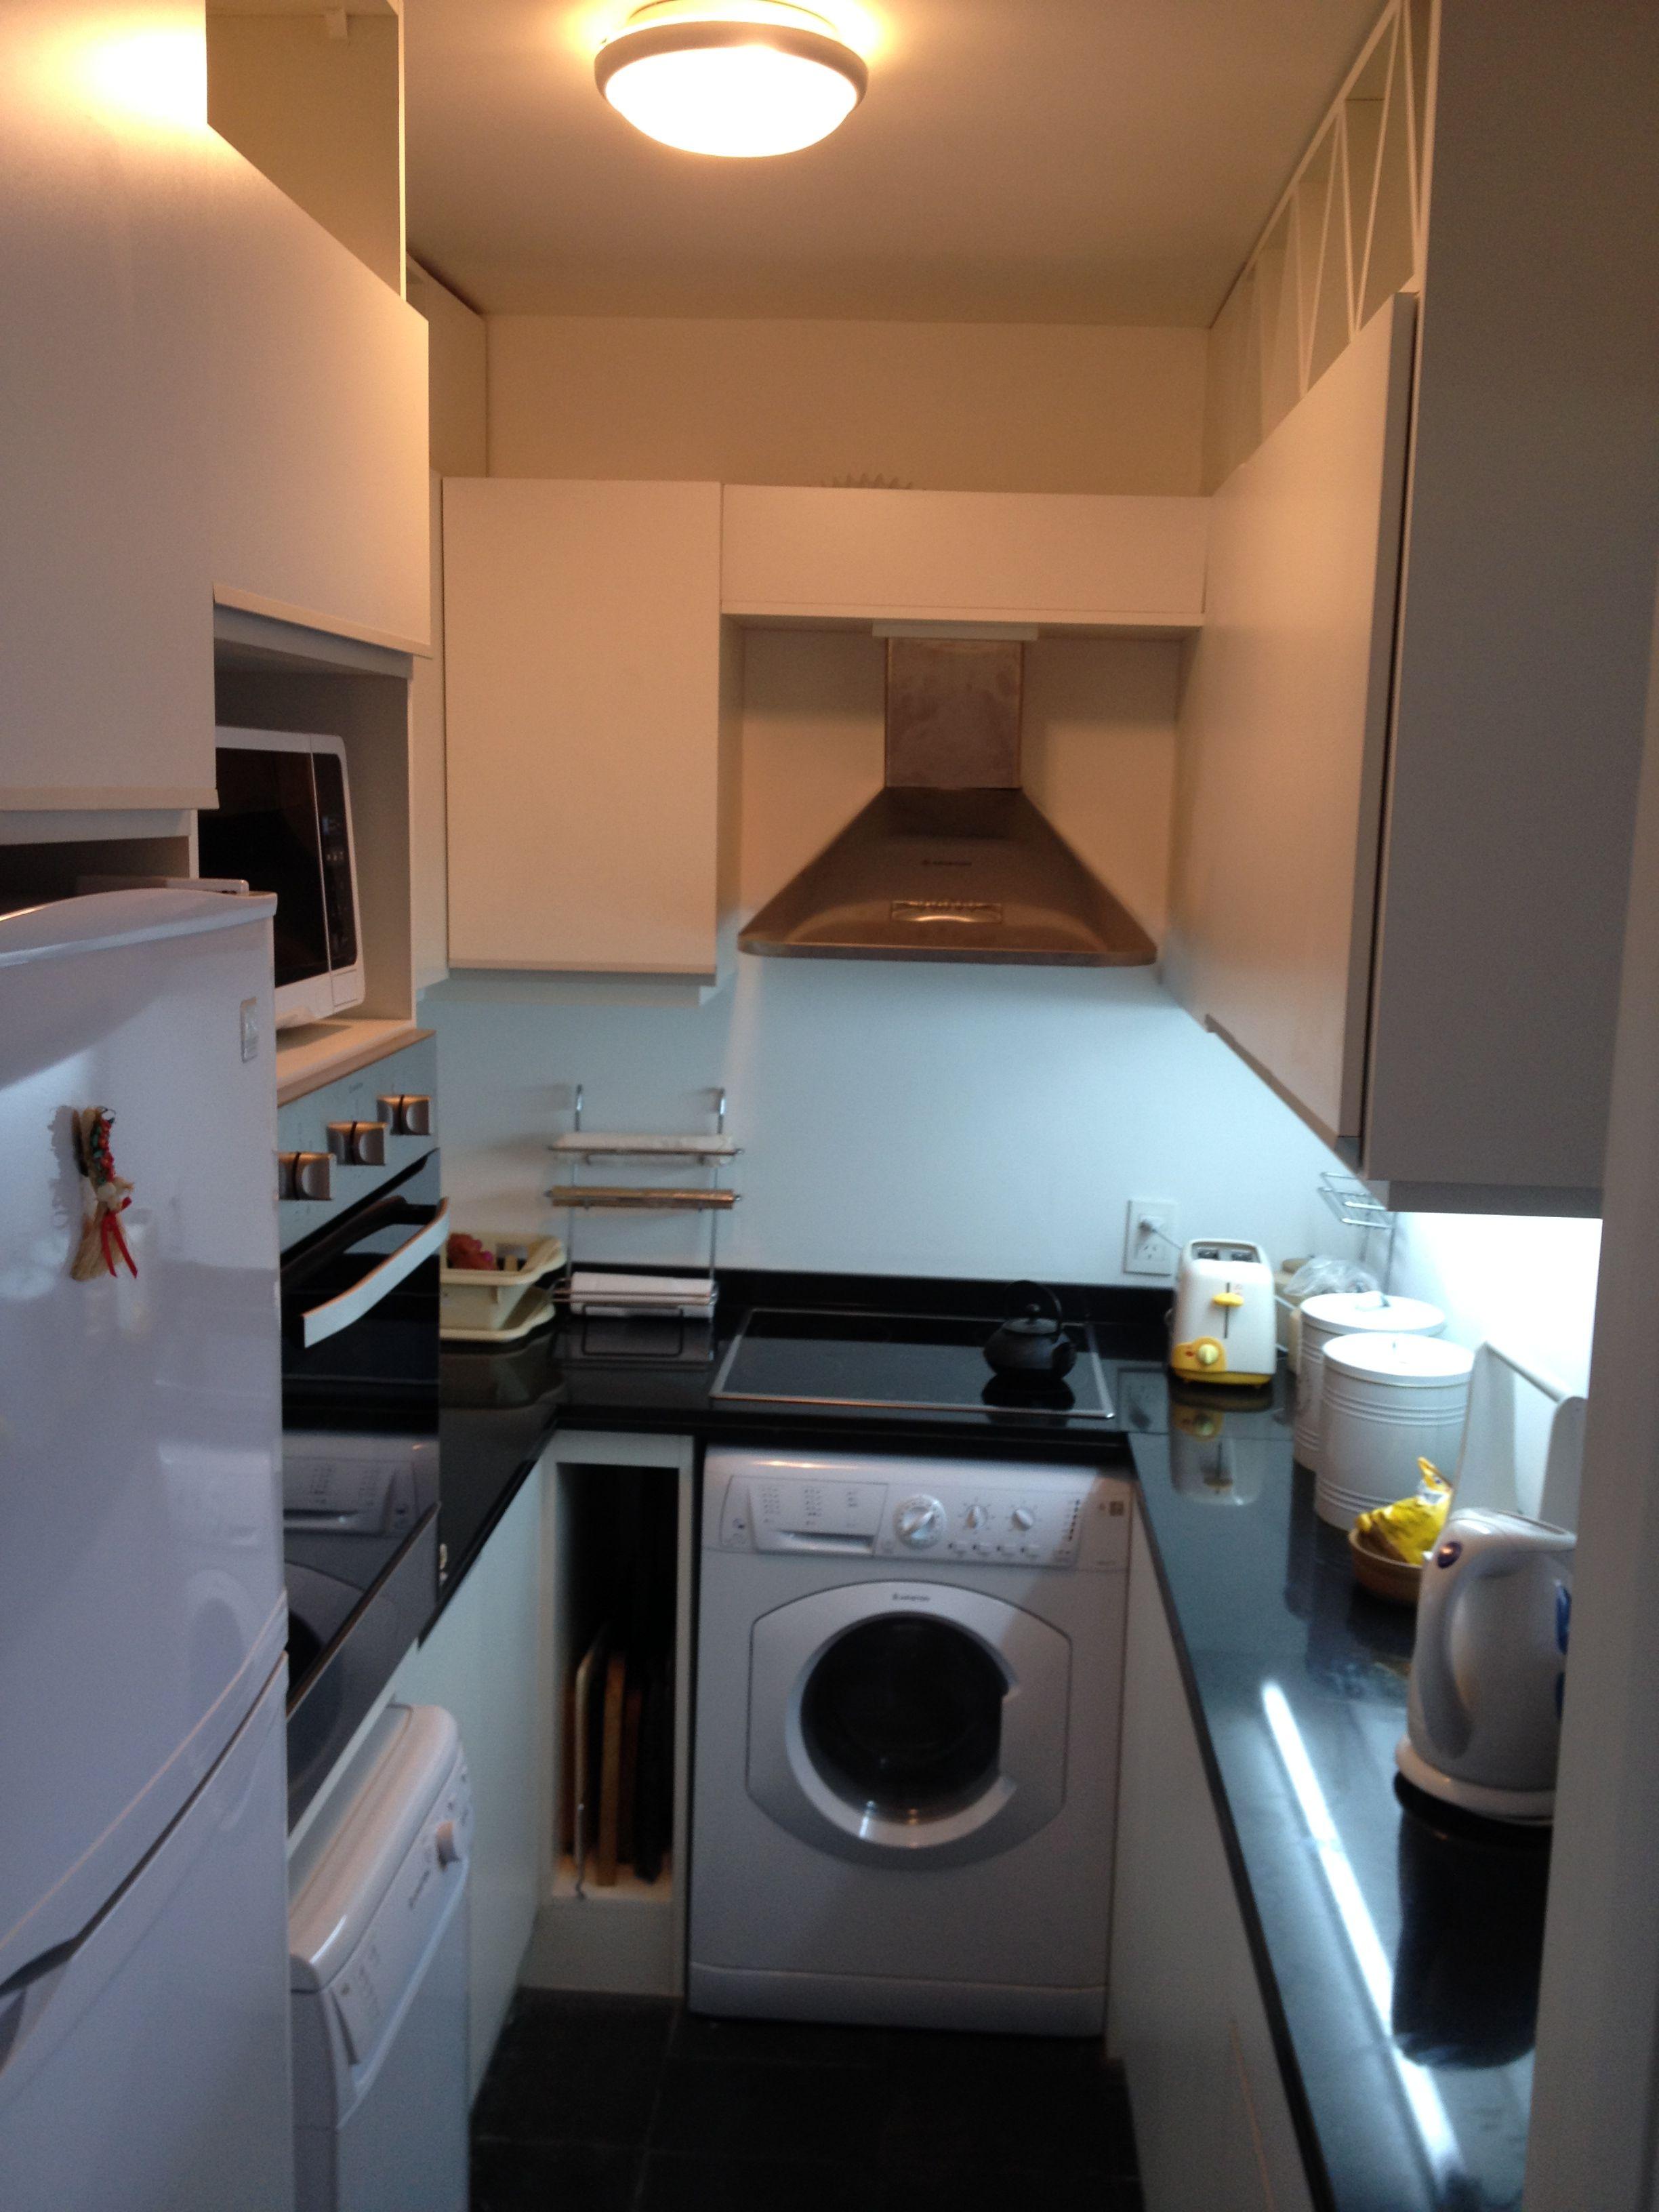 Grupo3 Cocina Blanca 5m2 Mini Espacio Aprovechado Al M Ximo  # Budnik Muebles De Cocina